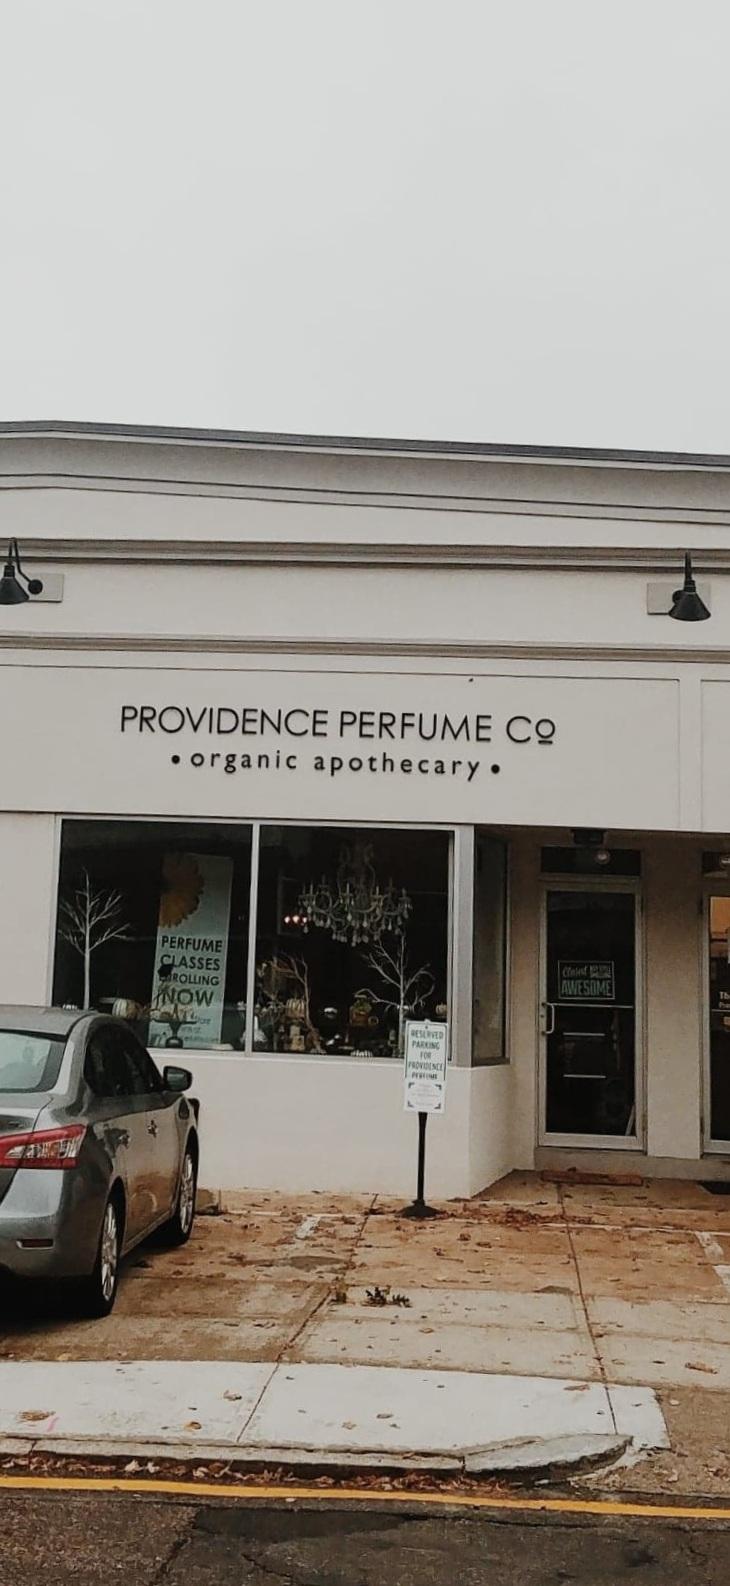 providence perfume co